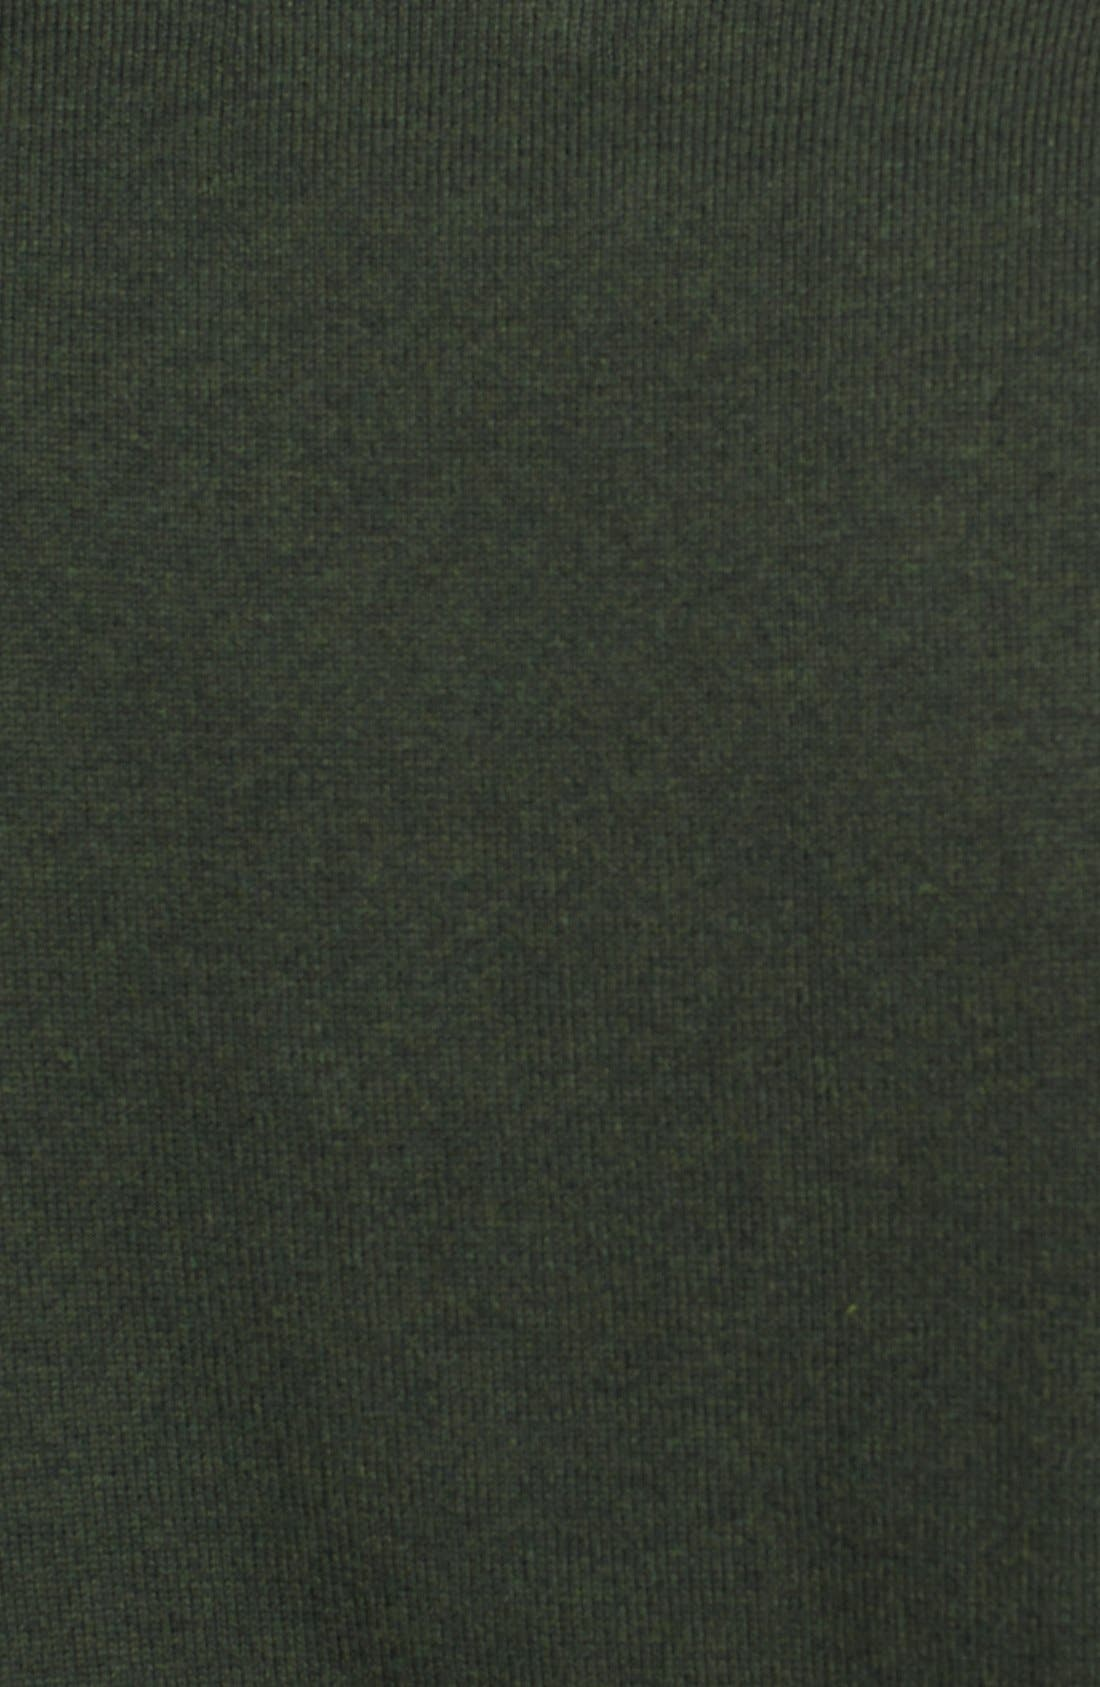 Alternate Image 3  - Wallin & Bros. Trim Fit Cotton & Cashmere Crewneck Sweater